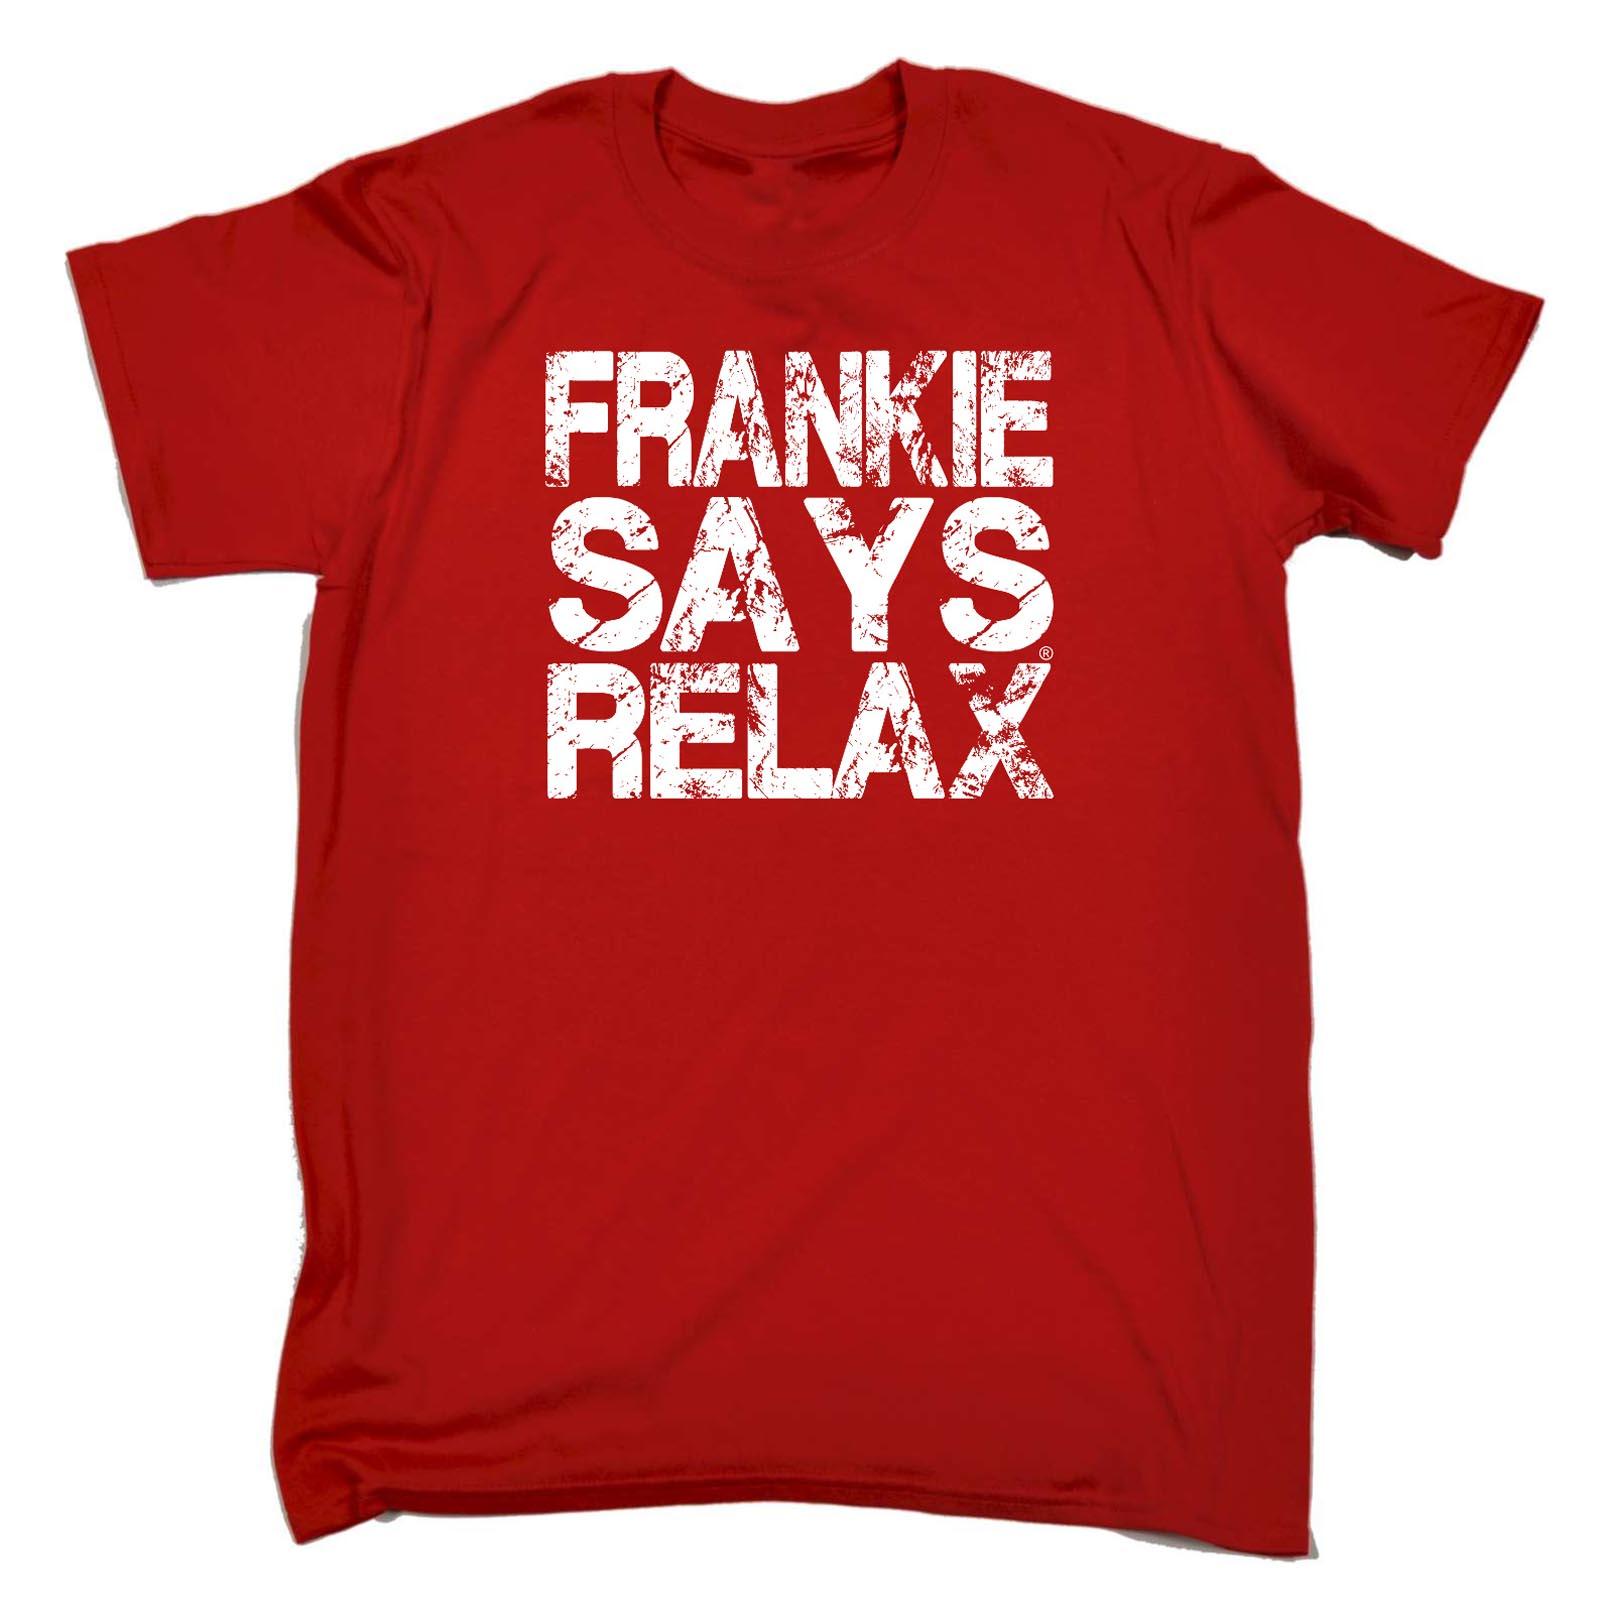 thumbnail 14 - Funny-Novelty-T-Shirt-Mens-tee-TShirt-Distress-White-Frankie-Says-Relax